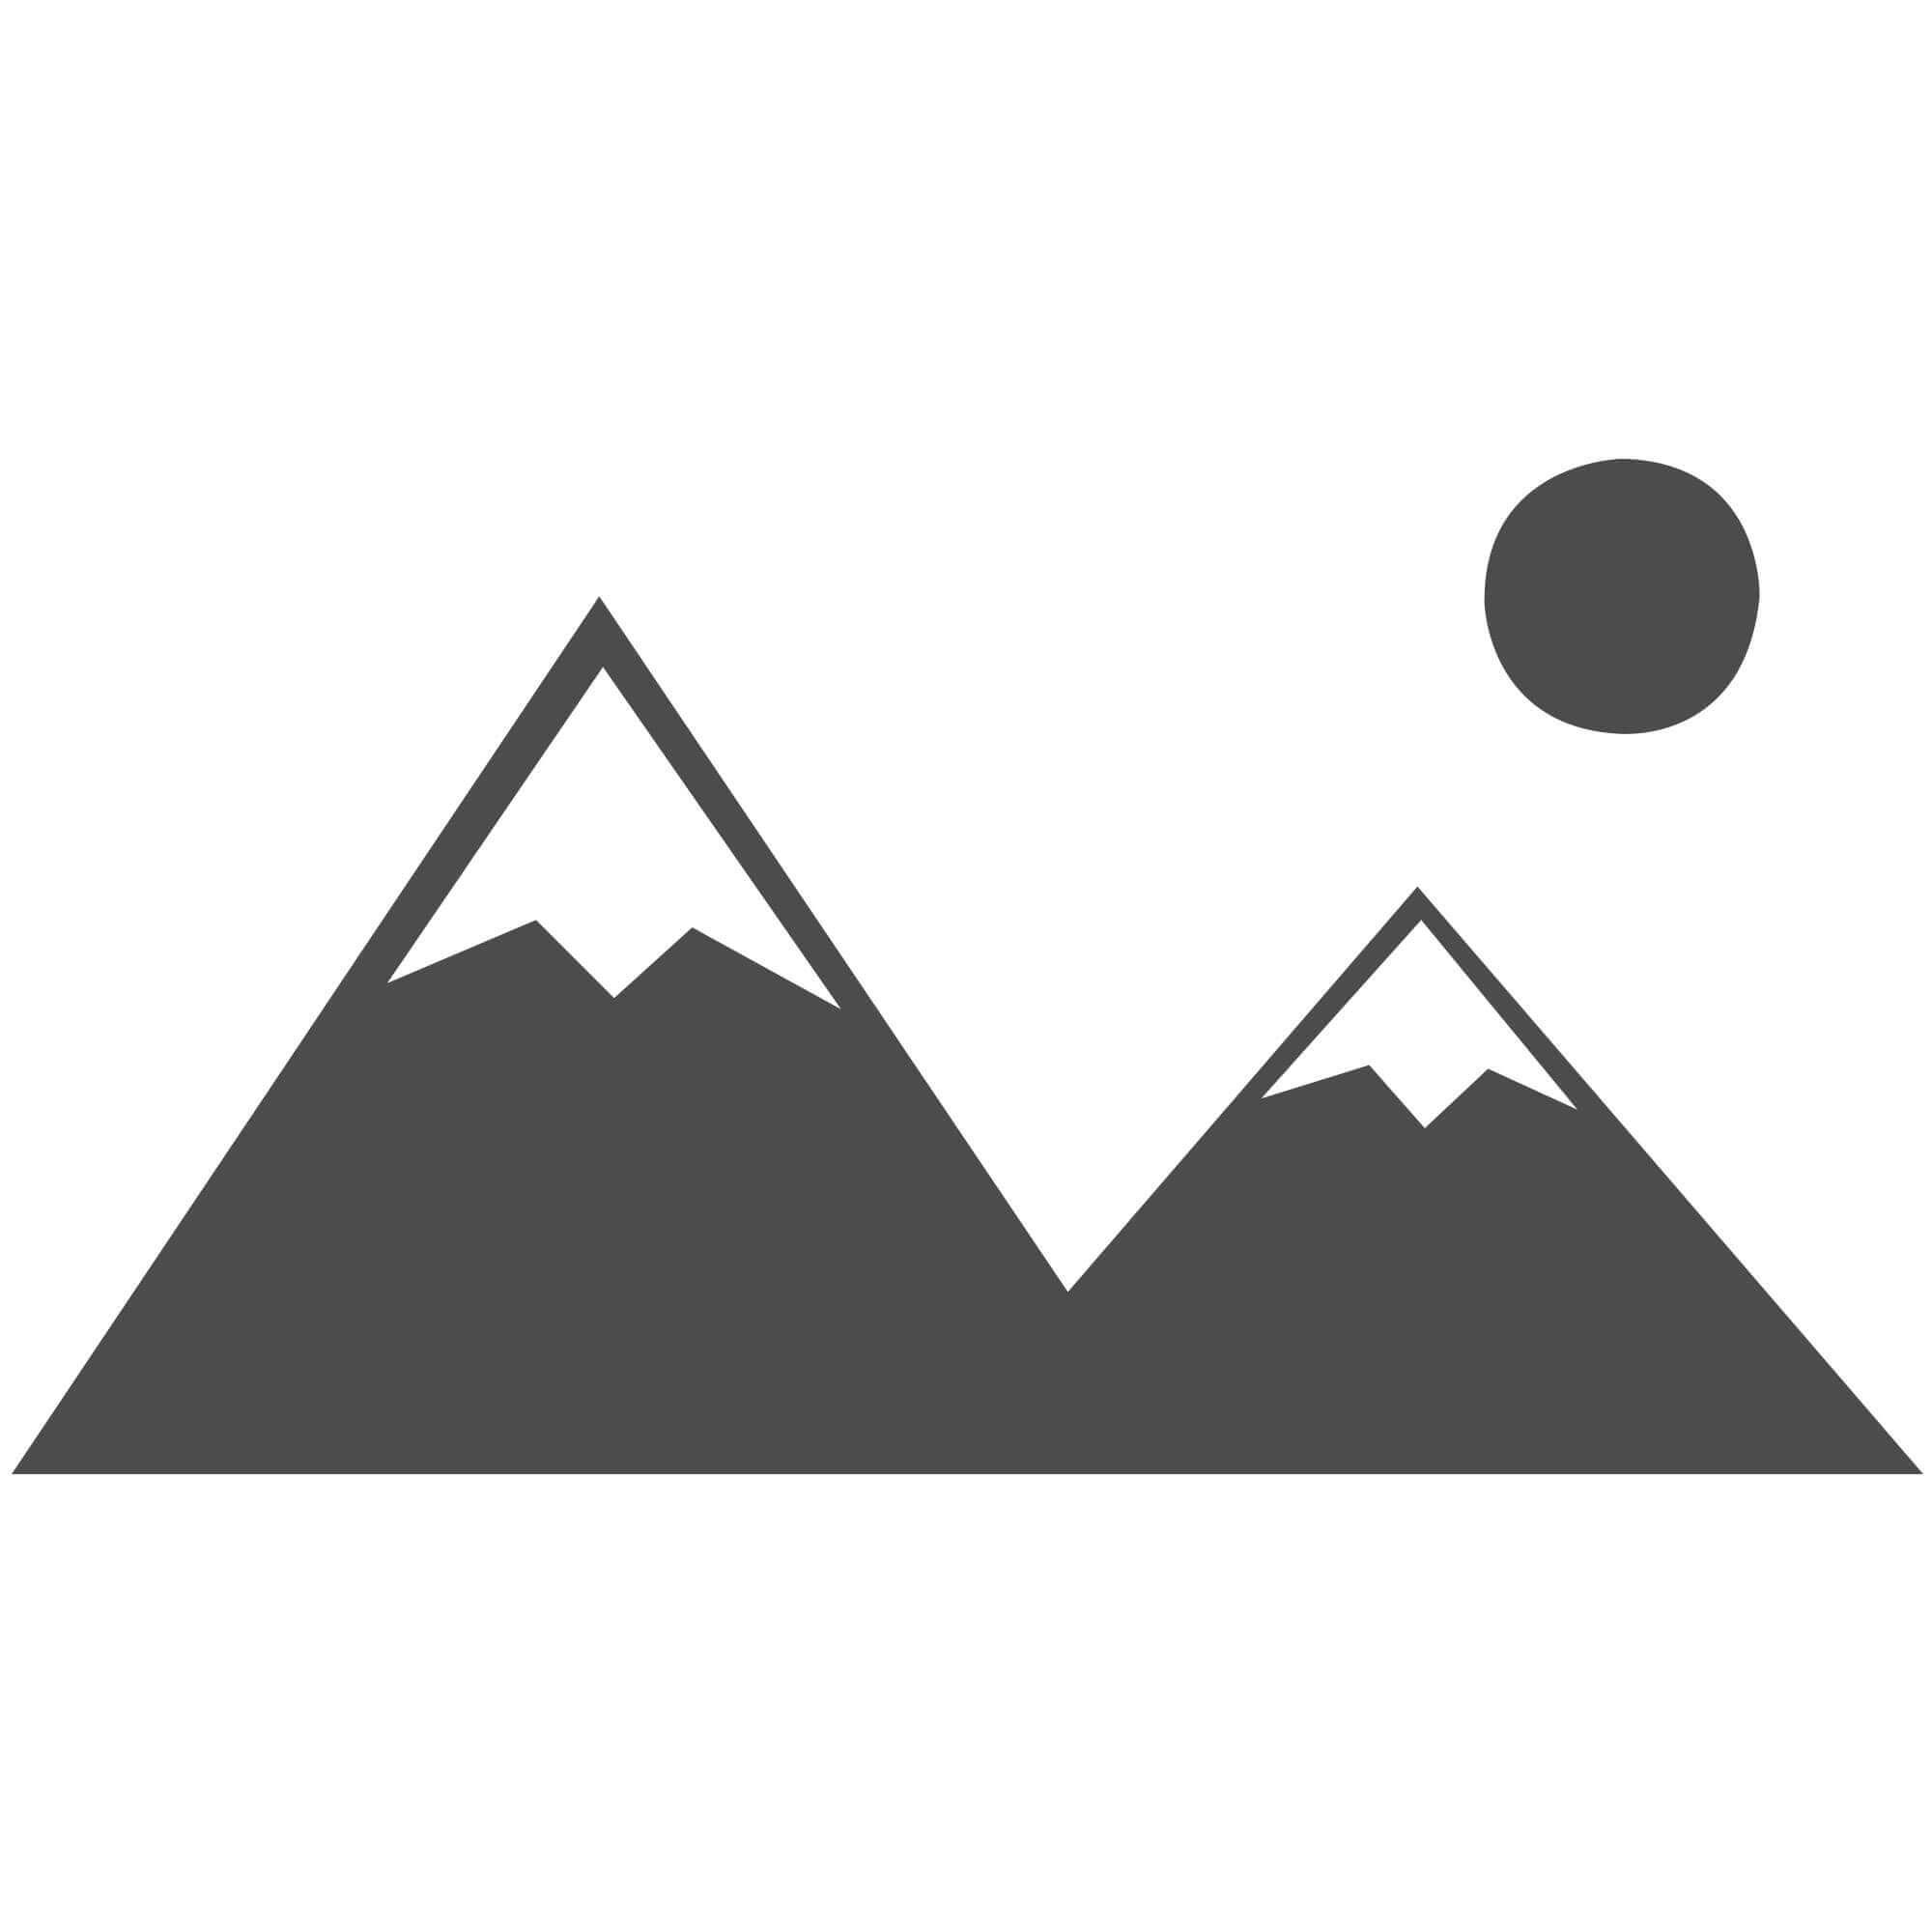 "Griot Stripe Rug - Ngoma - KI801 Indigo-160 x 226 cm (5'3"" x 7'5"")"